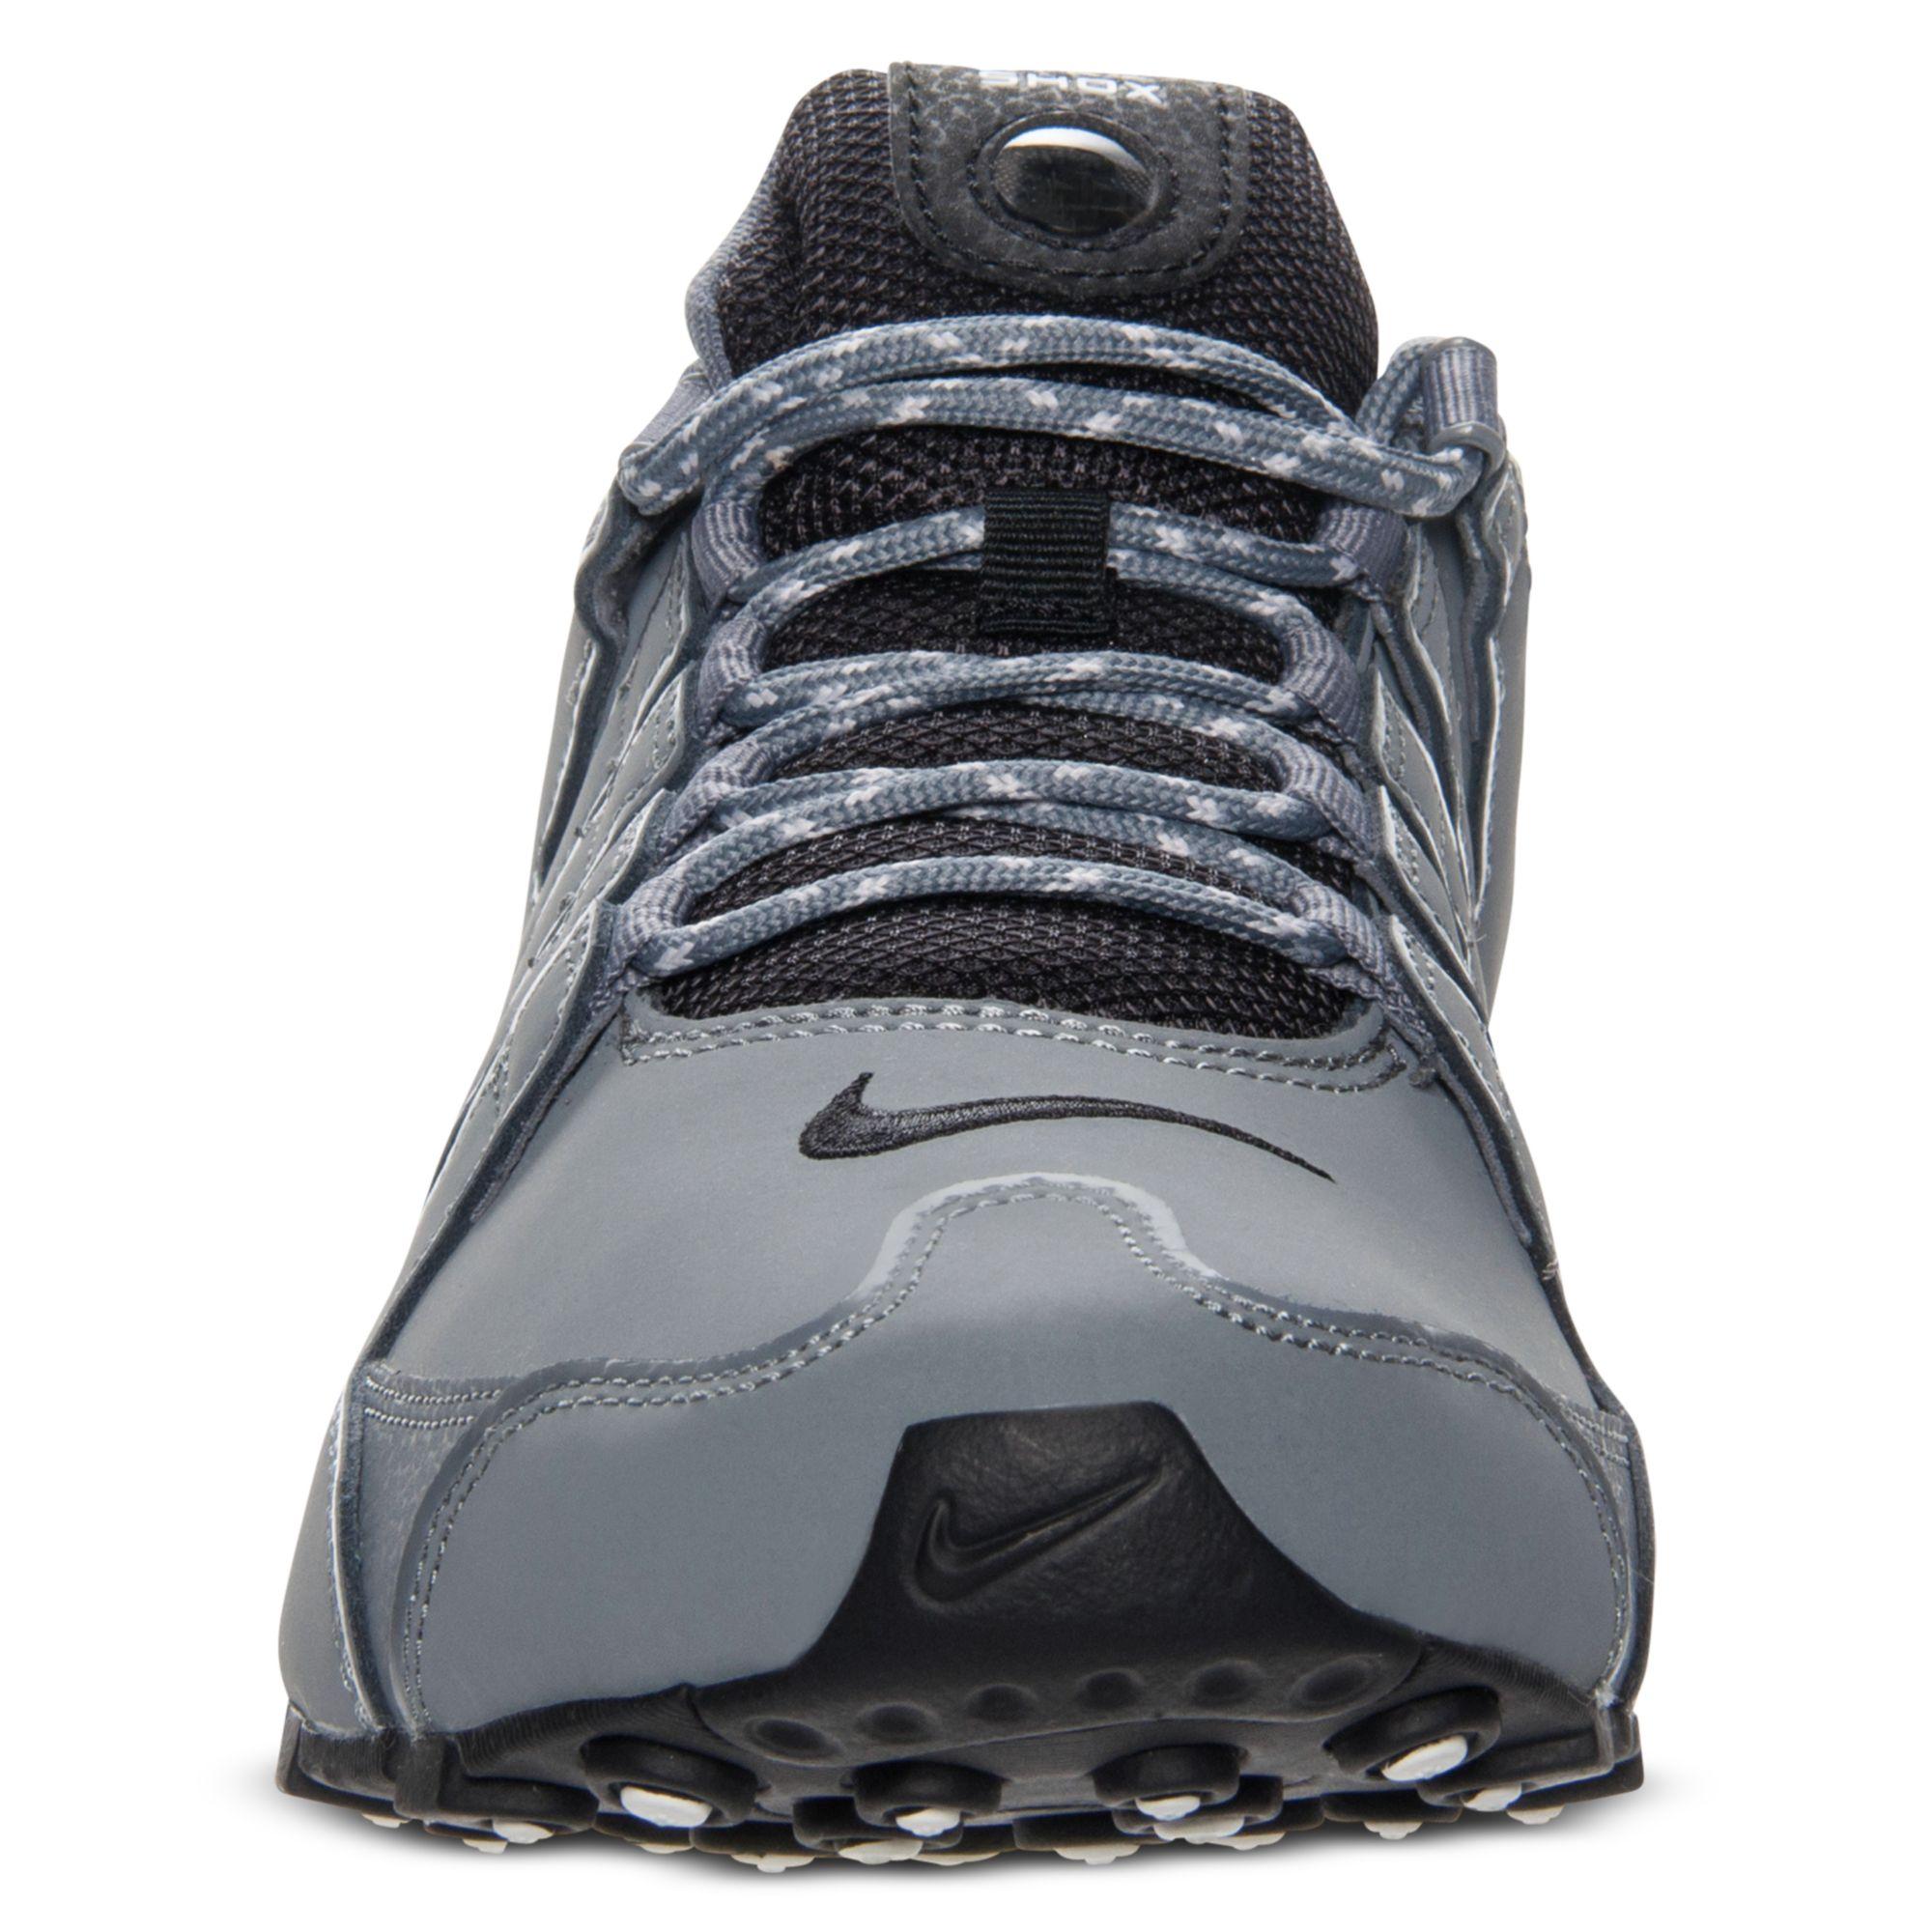 Nike Mens Shox Nz Eu Running Sneakers in Gray for Men - Lyst